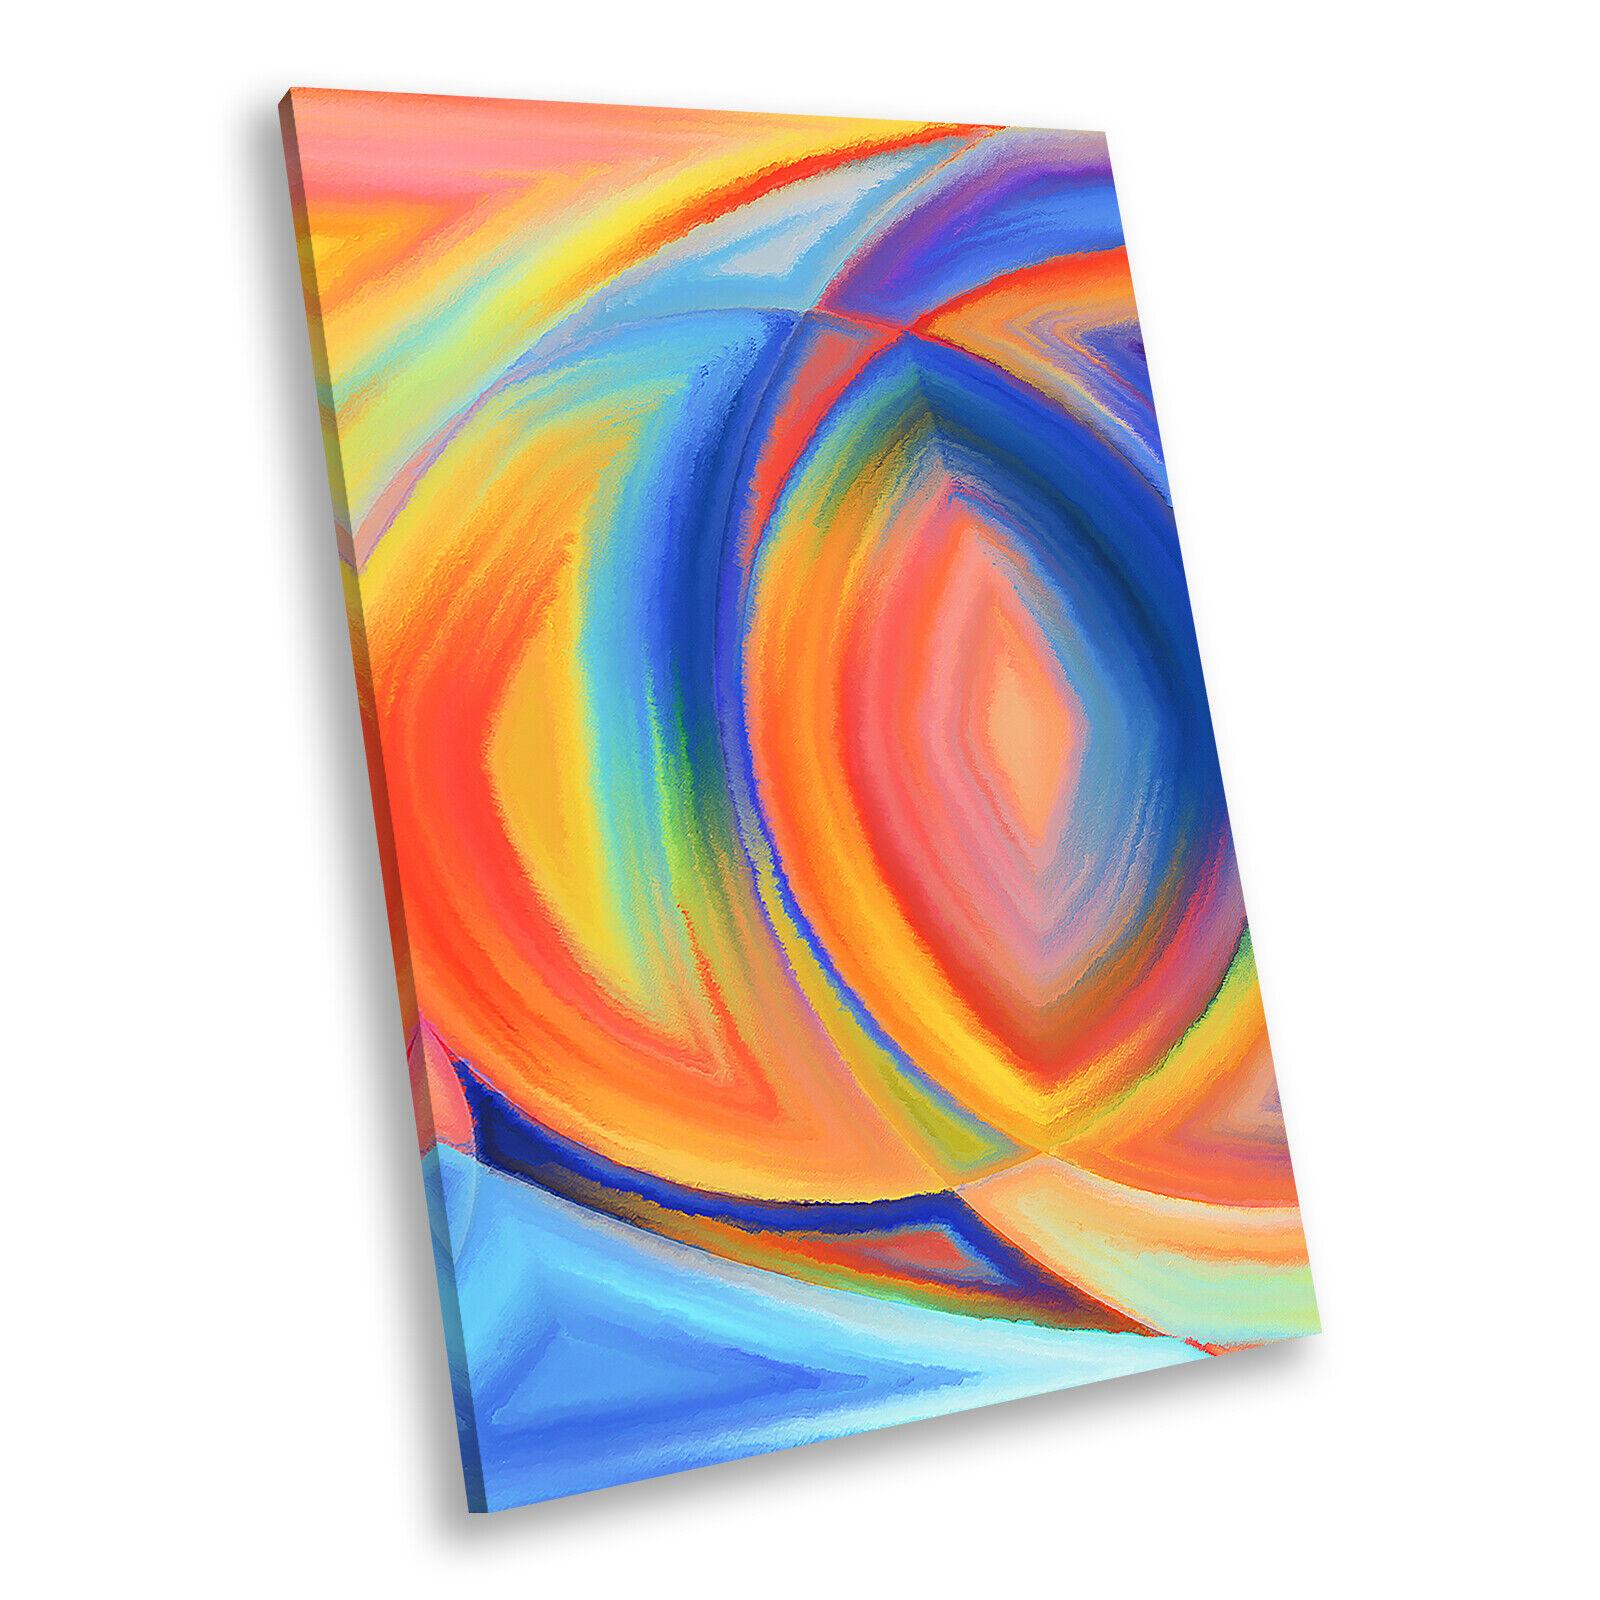 Blau Orange Colourful Portrait Abstract Canvas Wall Art Large Picture Prints